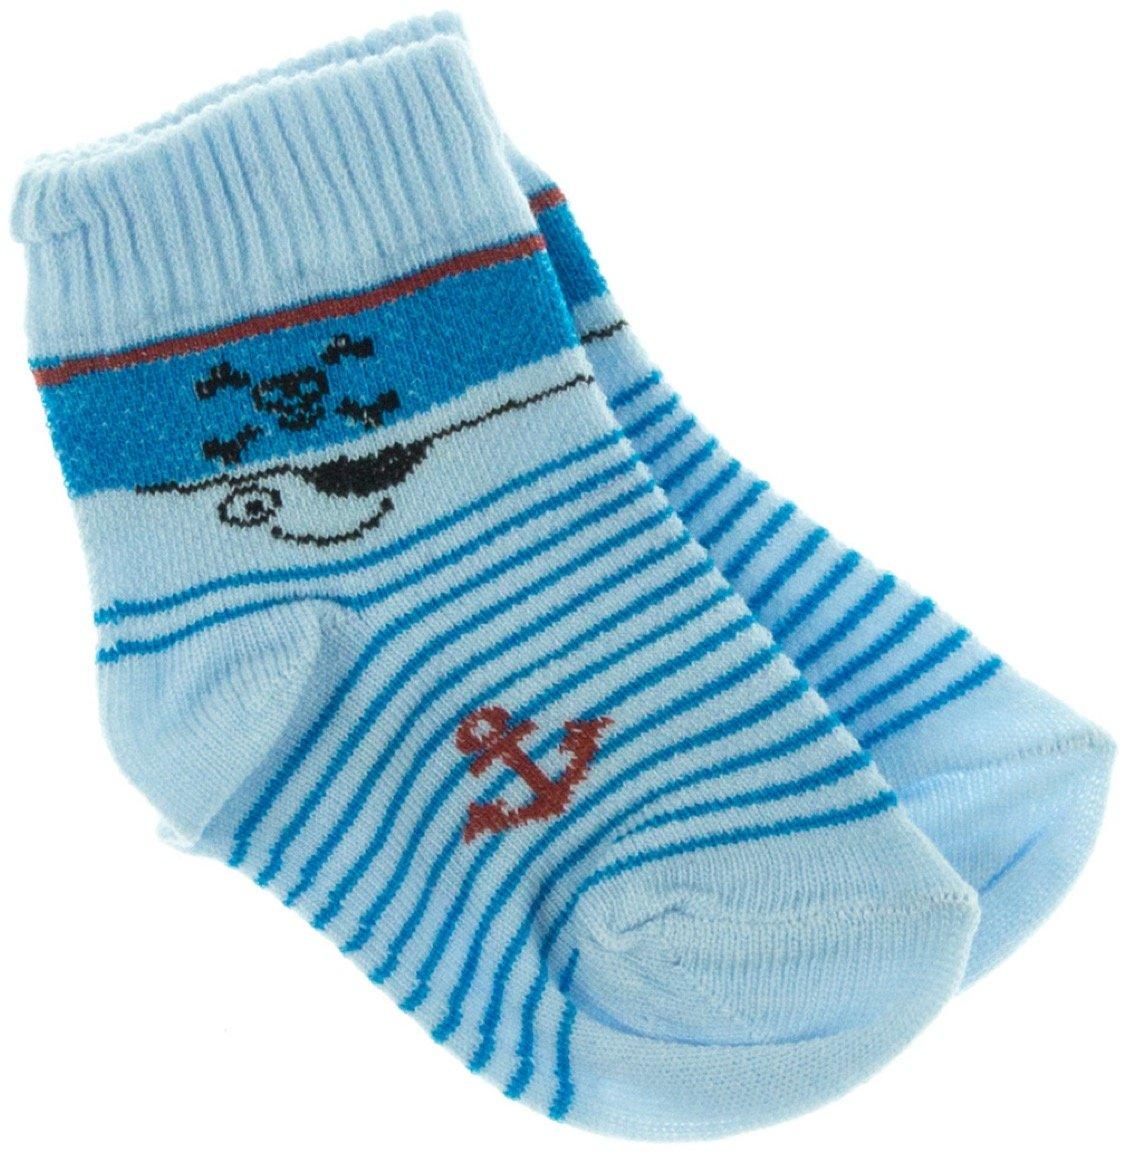 Bella Calze παιδικές κάλτσες «Blue Pirate»